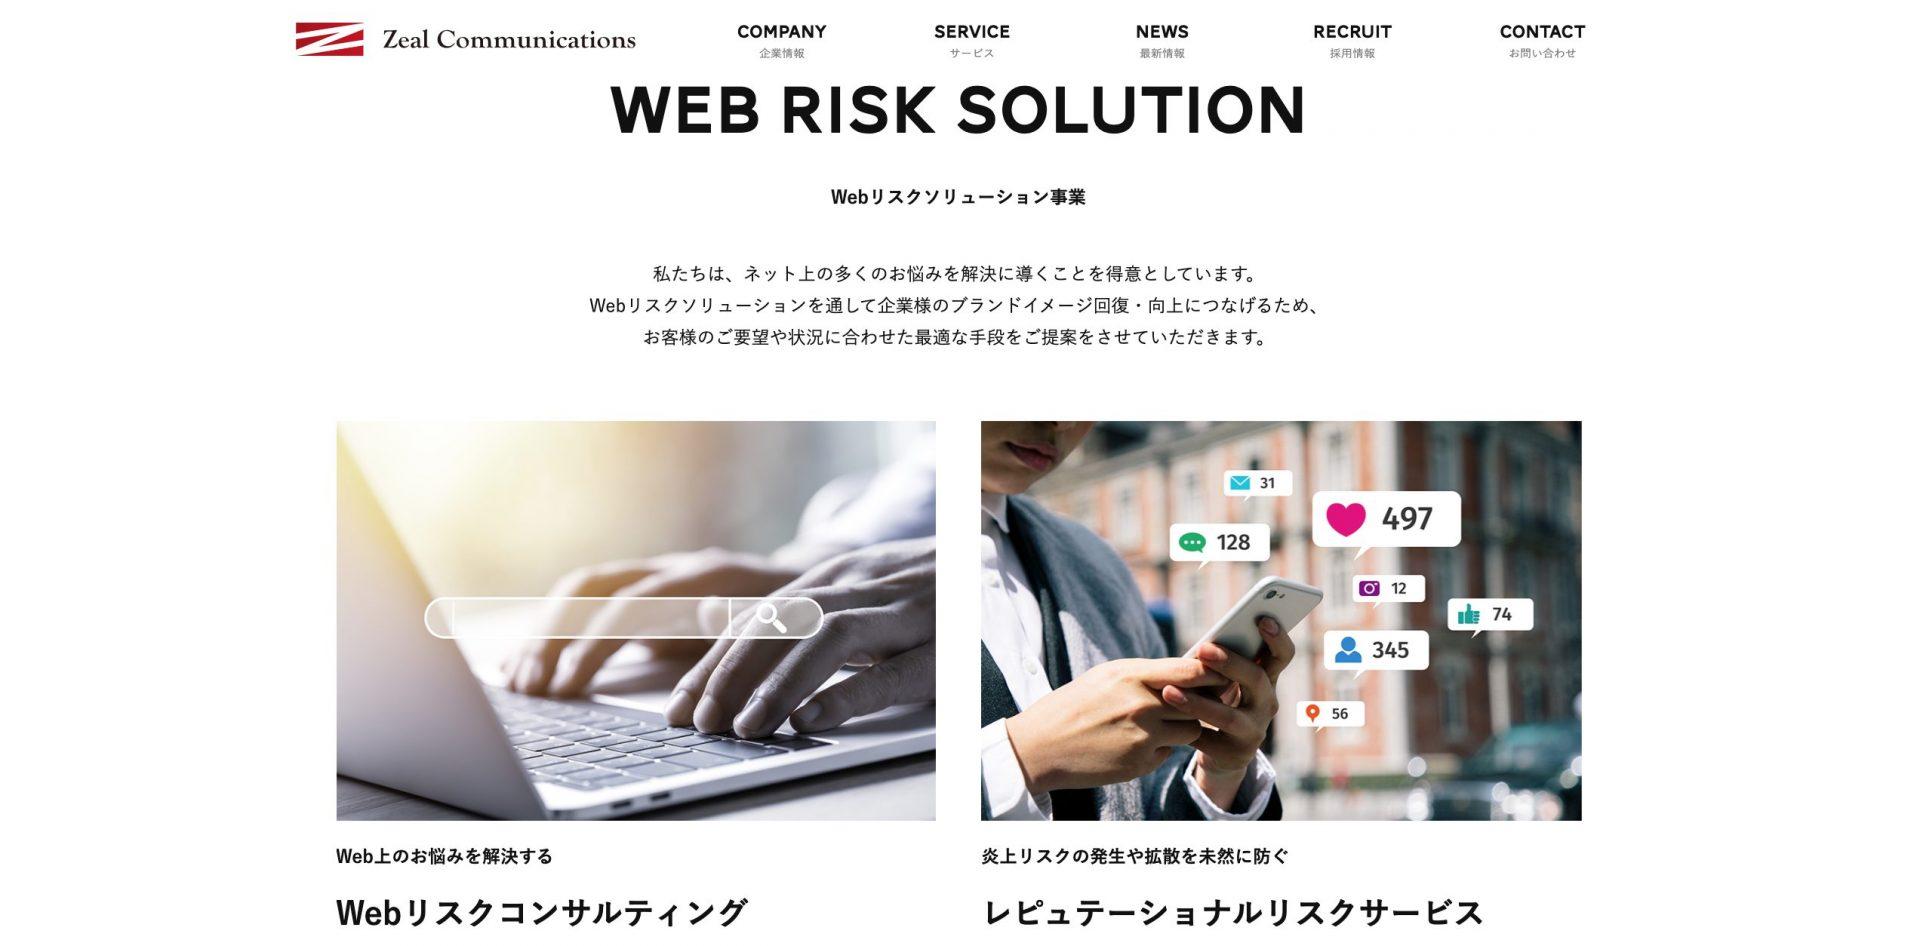 Webリスクソリューション事業